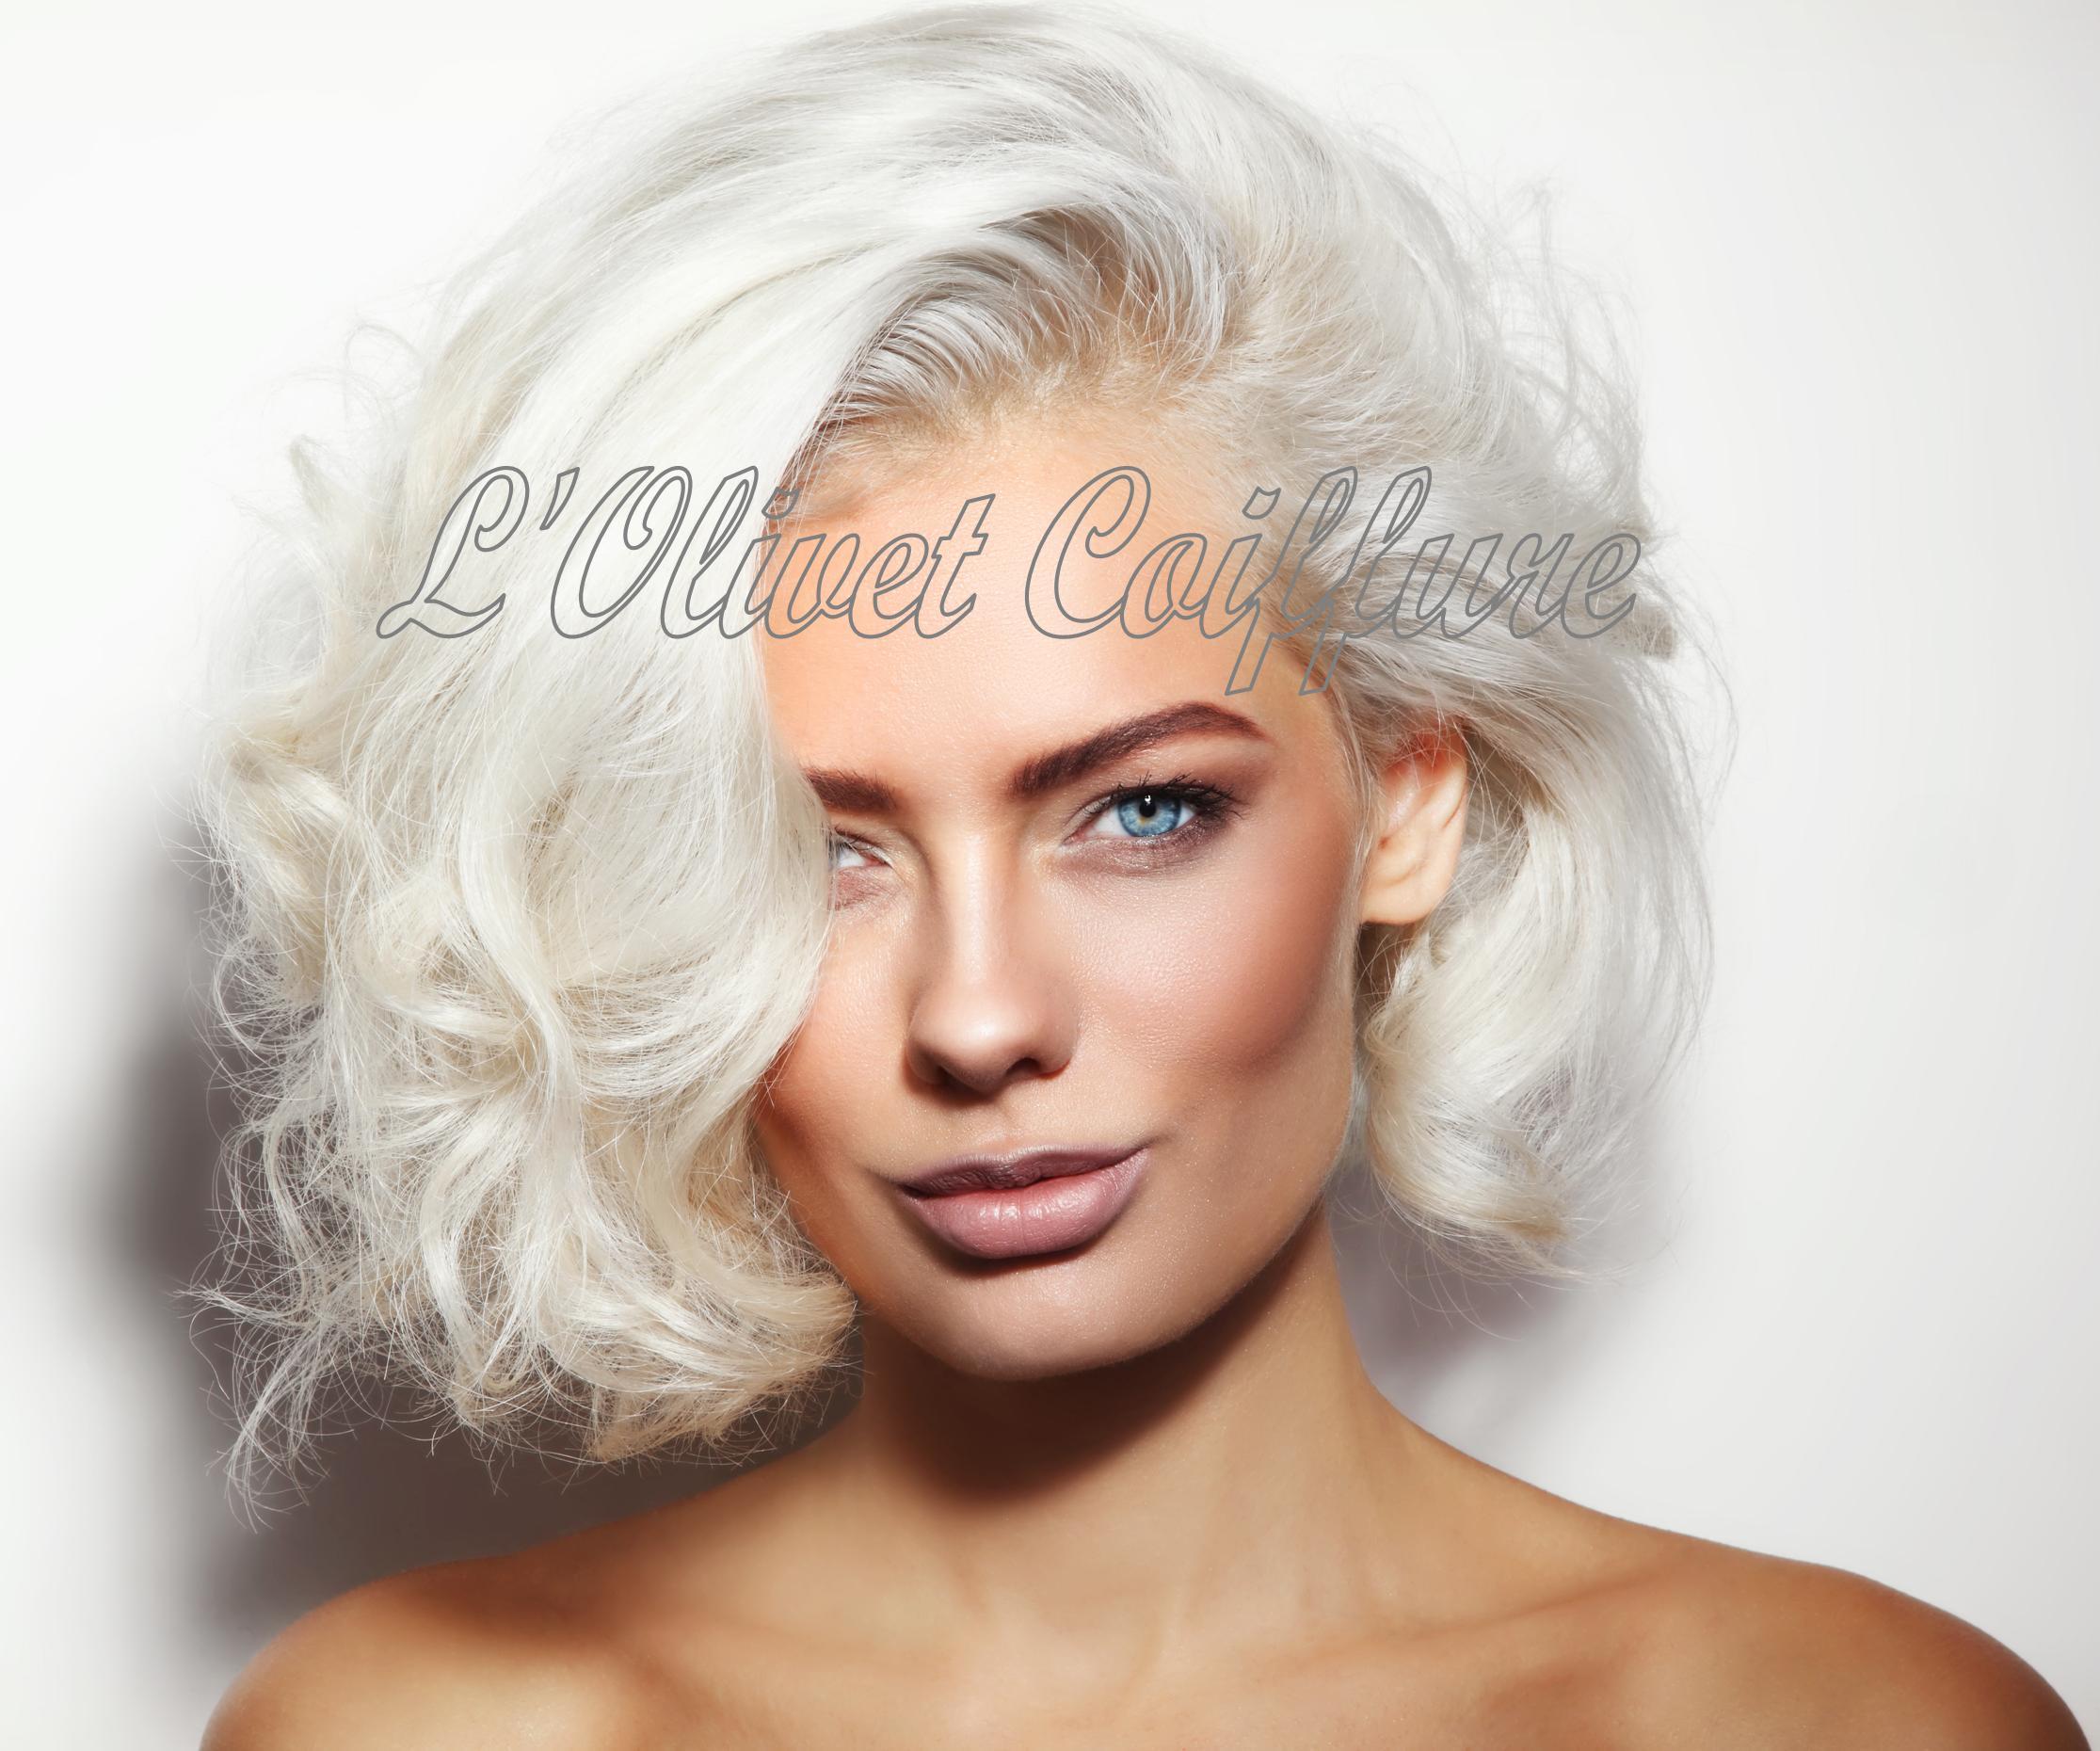 l'olivet coiffure | Le cannet